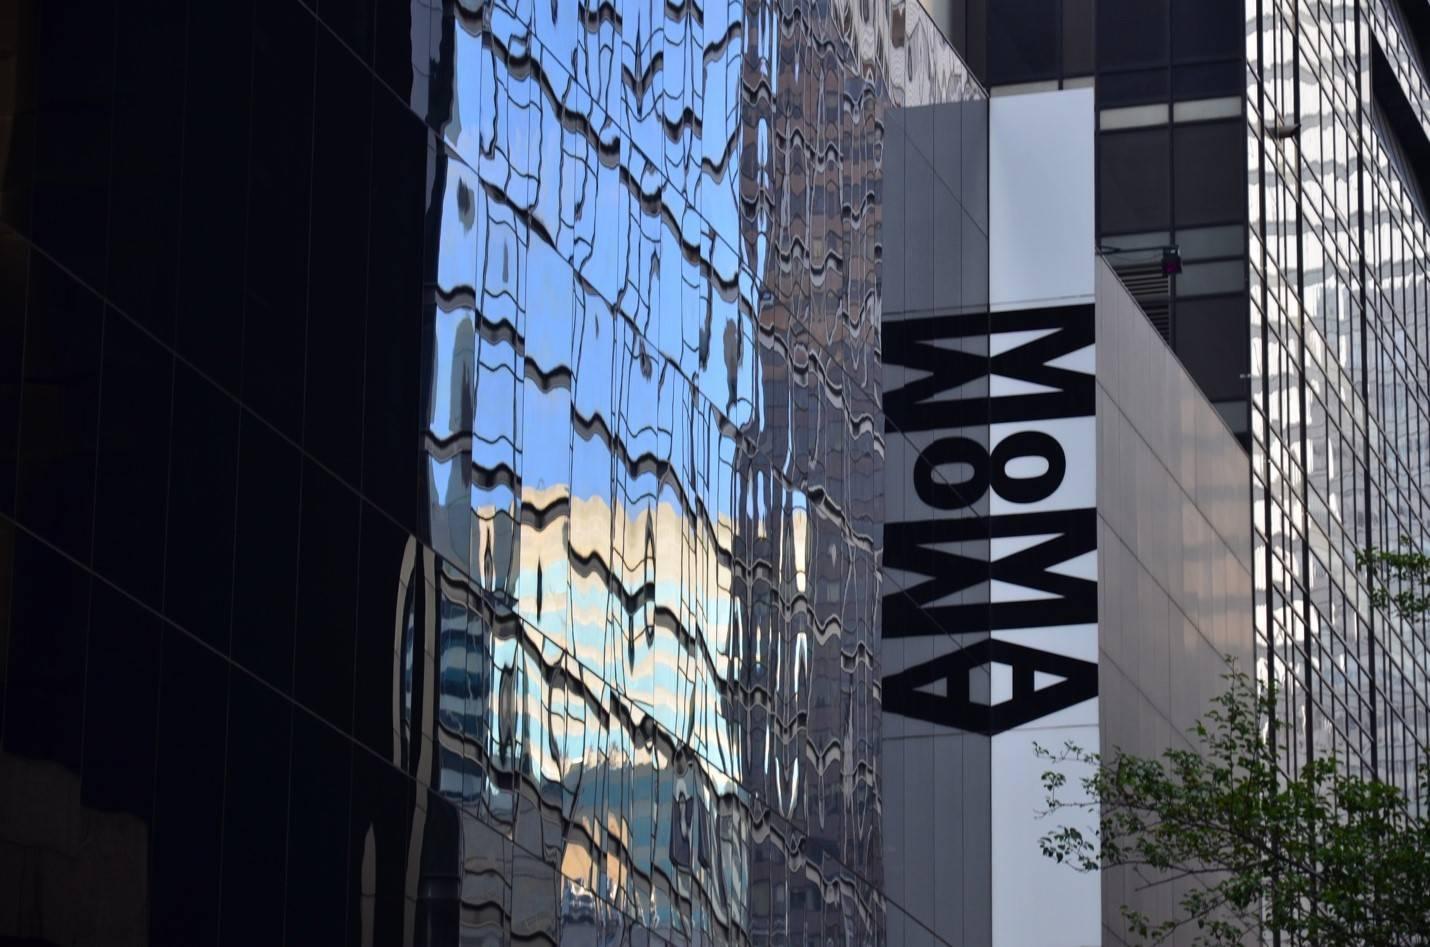 MoMa New York City NYC USA United States of America